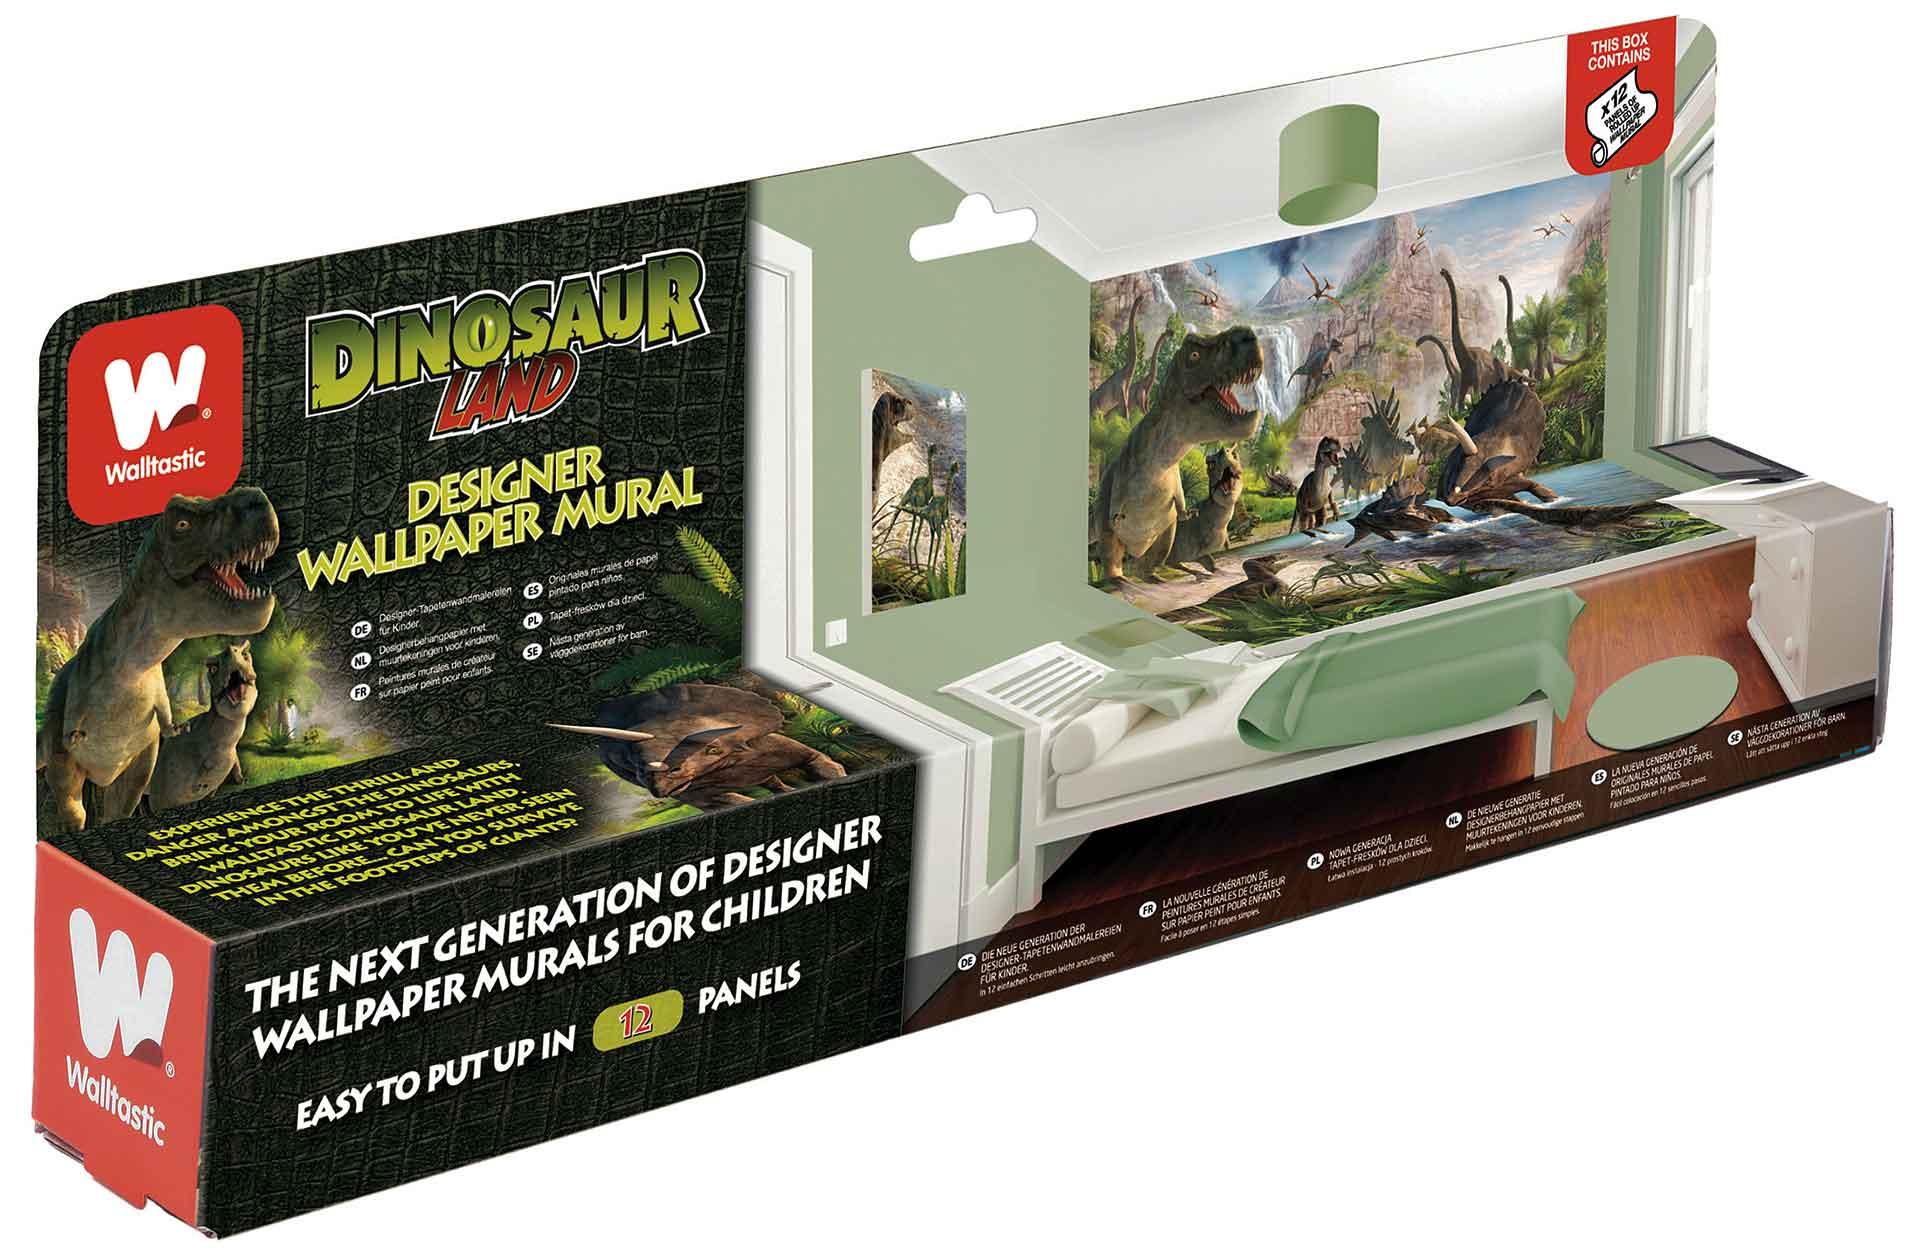 Fototapete Kinderzimmer Dinosaurier Park T Rex Walltastic Fototapete